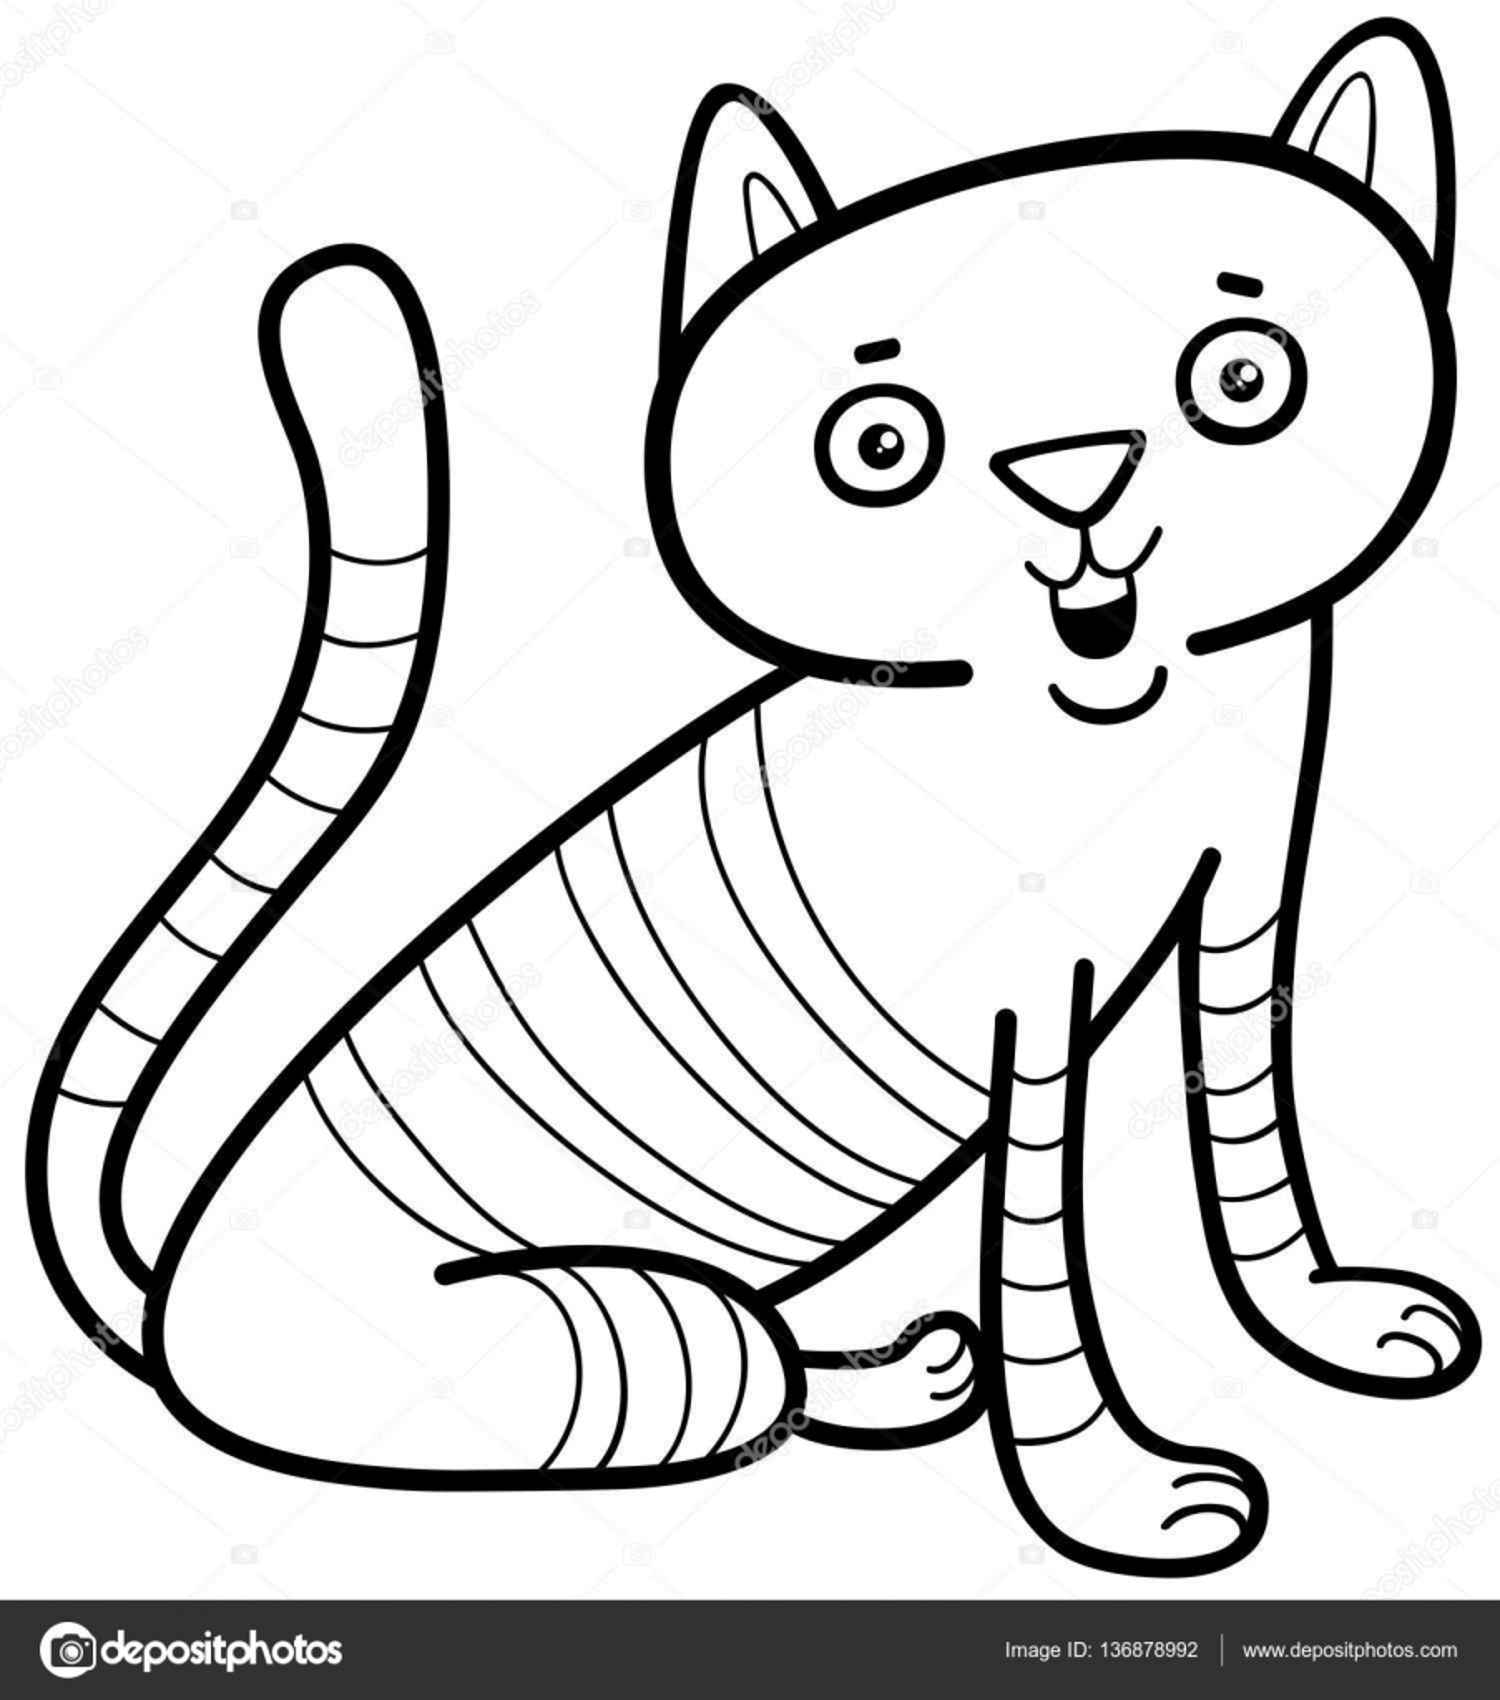 Malvorlagen Katze Charakter — Stockvektor © izakowski #136878992